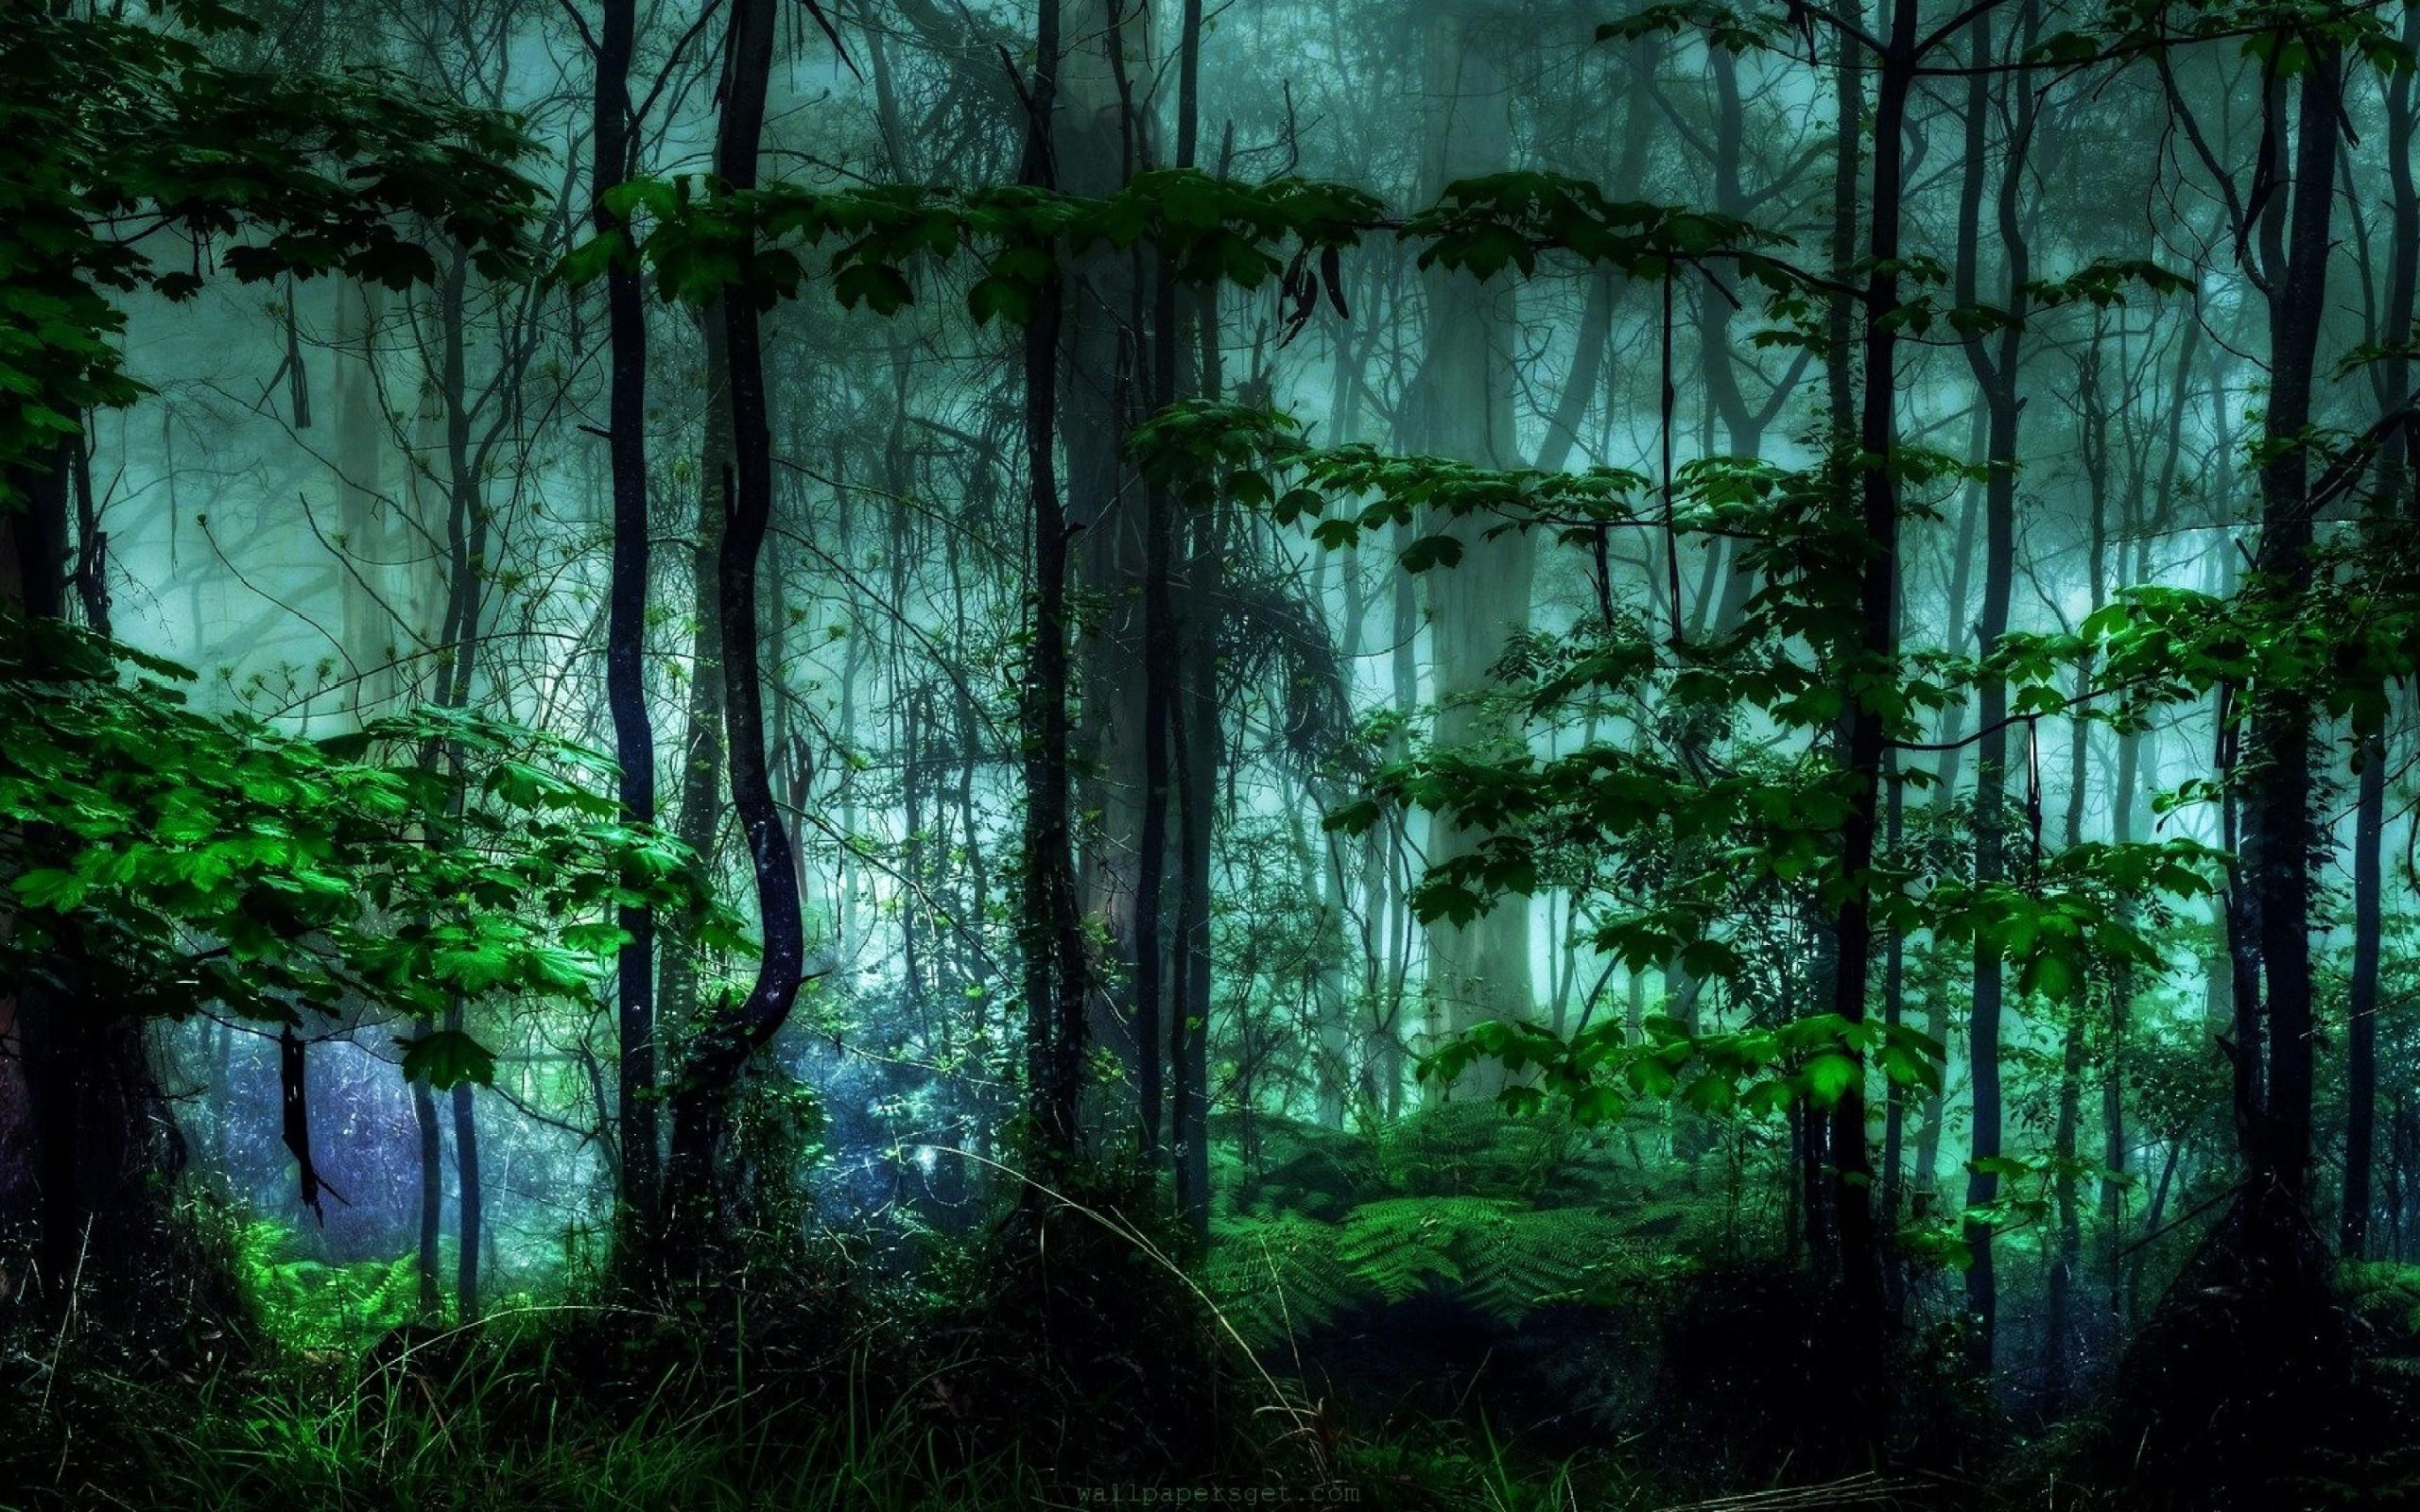 обратили меняющиеся картинки лес среди них